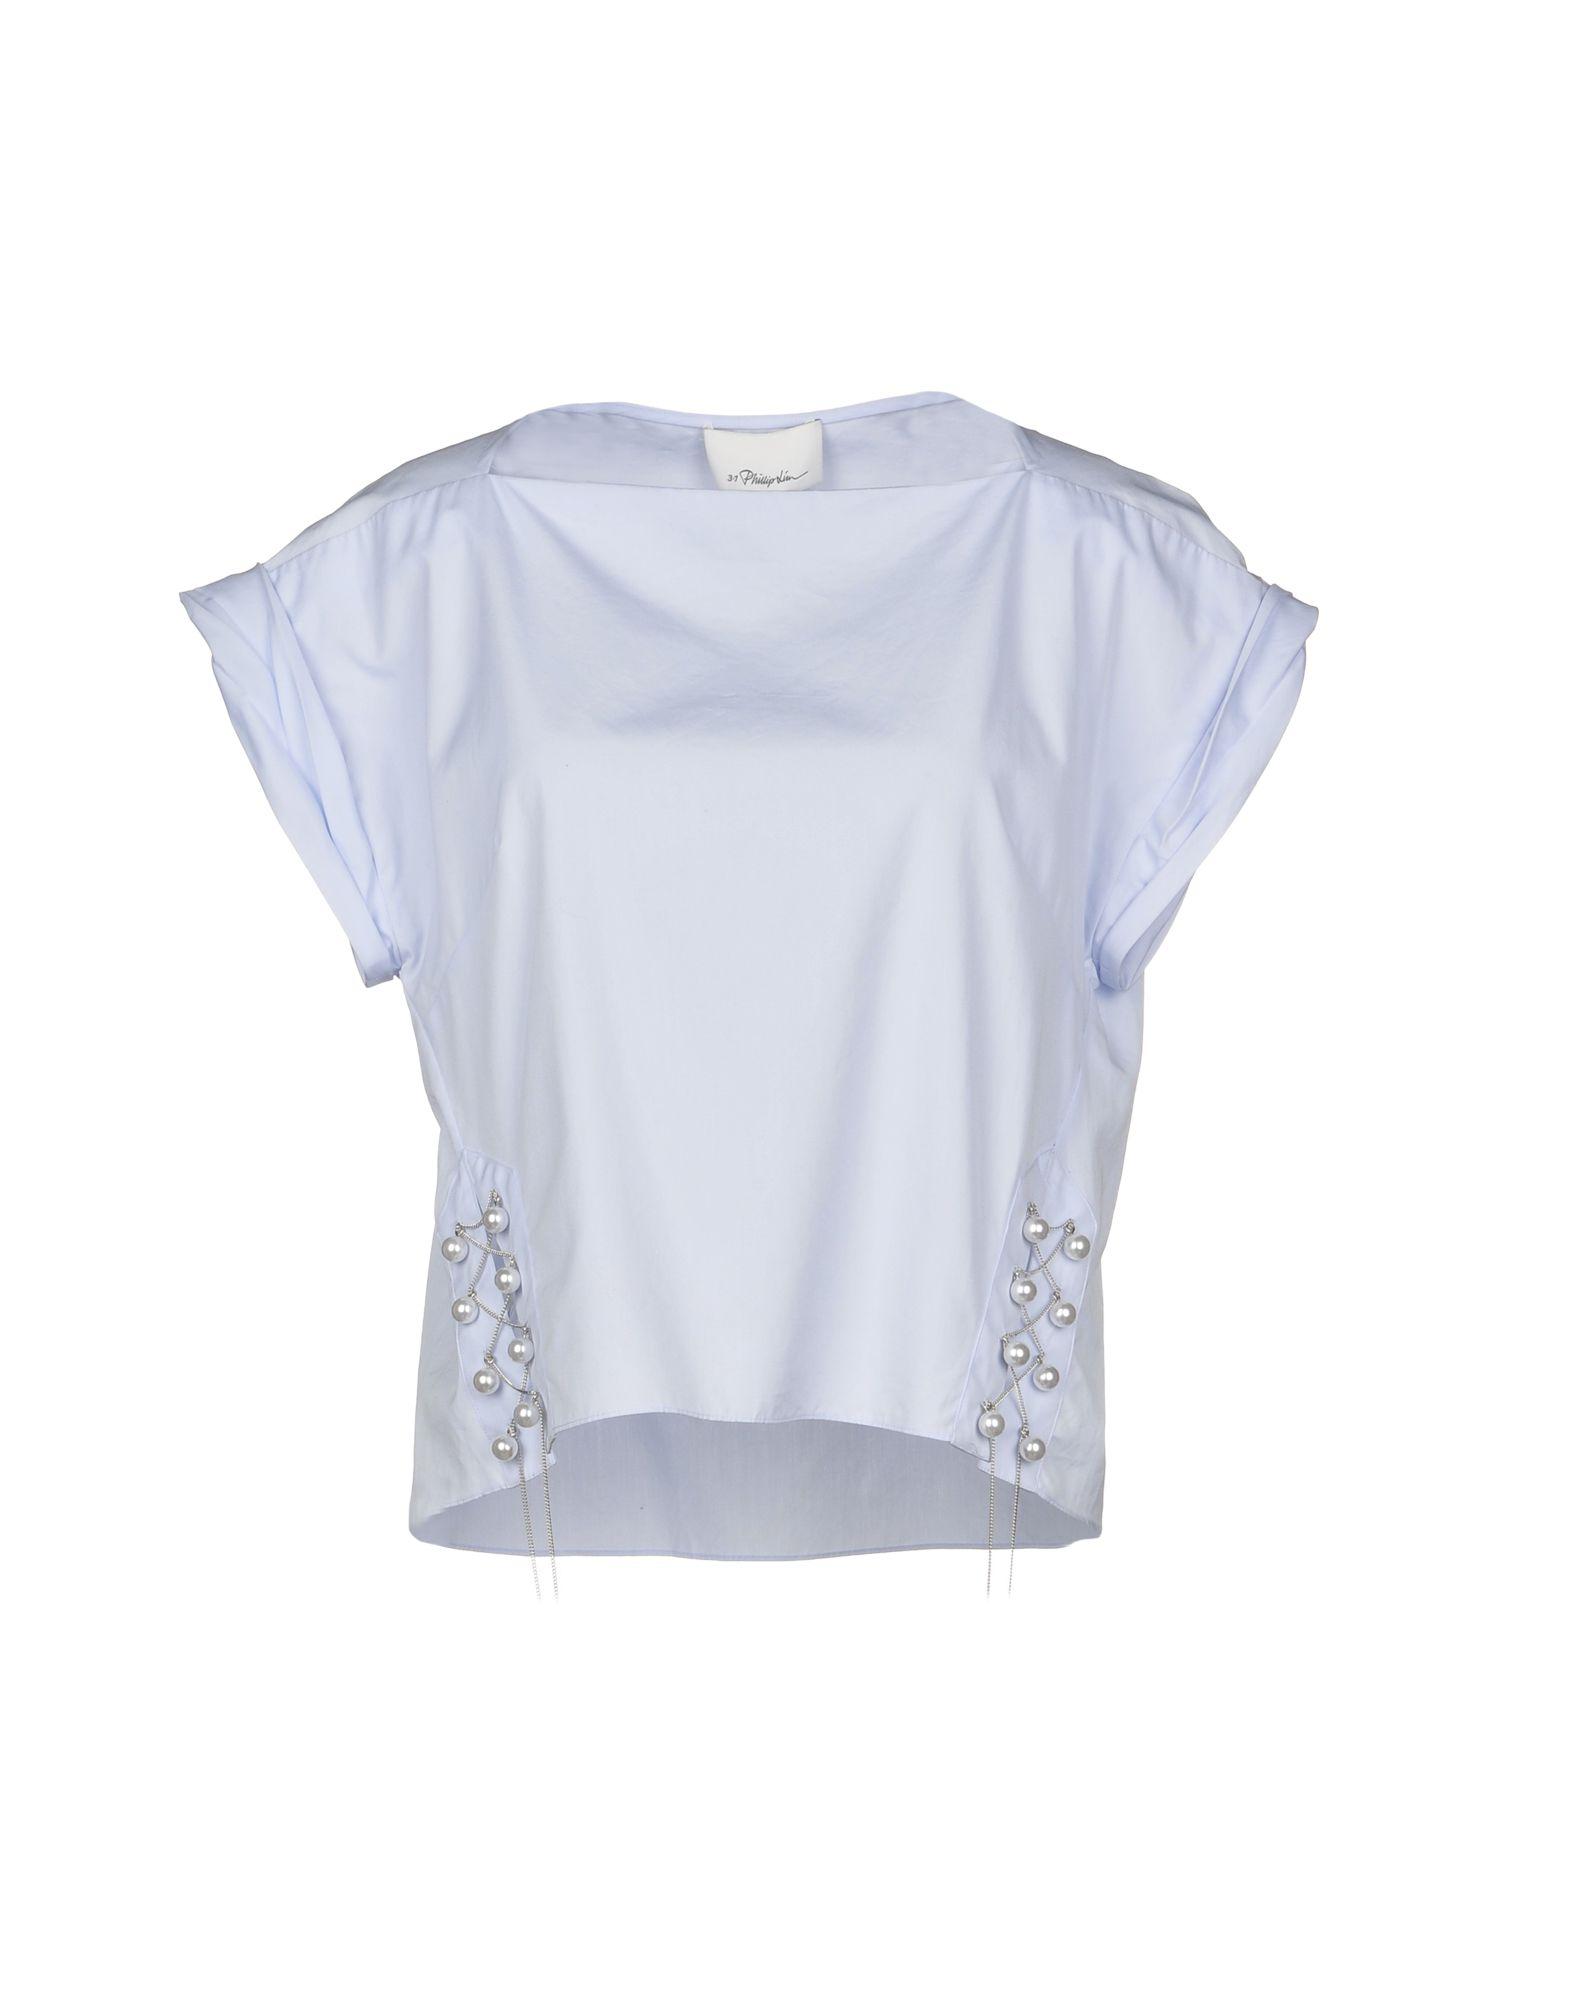 3.1 PHILLIP LIM Блузка 3 1 phillip lim асимметричная хлопковая блузка